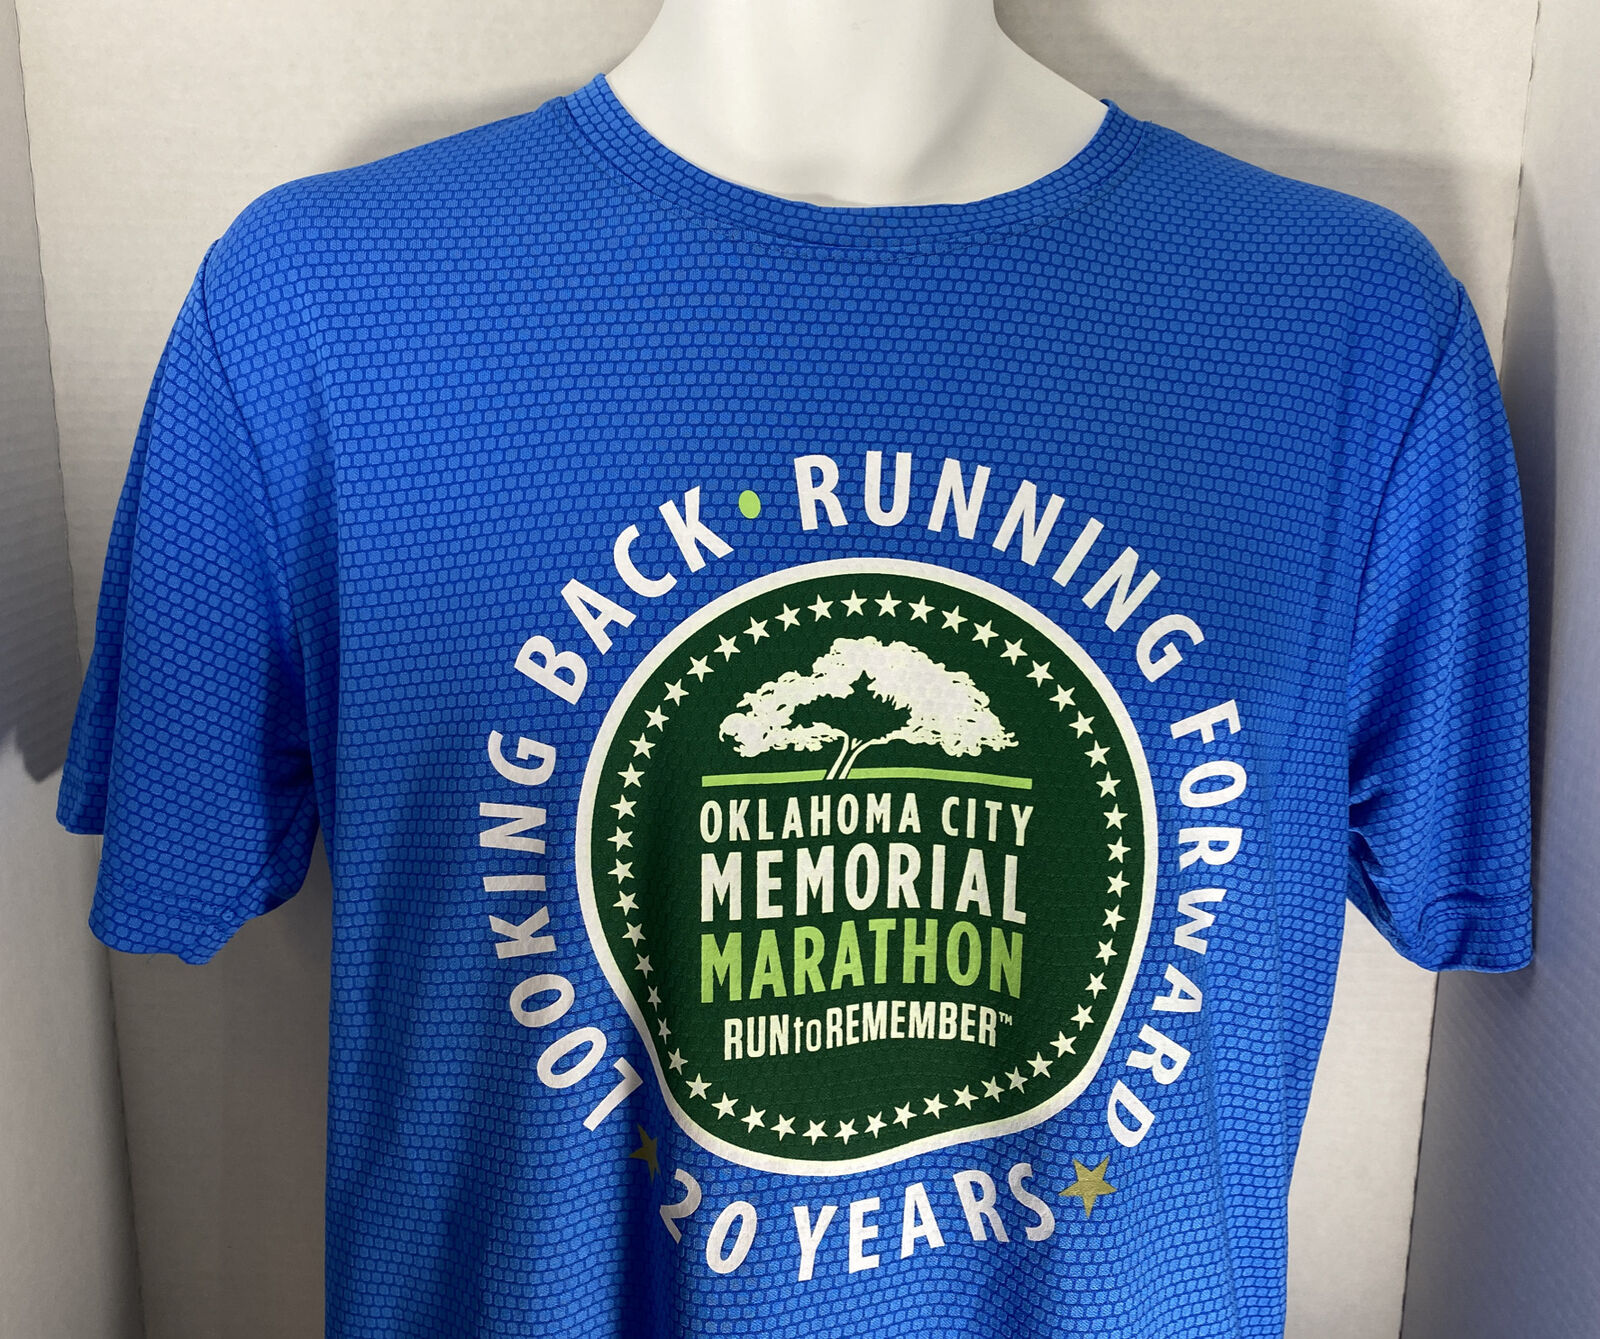 Oklahoma City Memorial Marathon Run to Remember 2020 Running Shirt VG Men's M